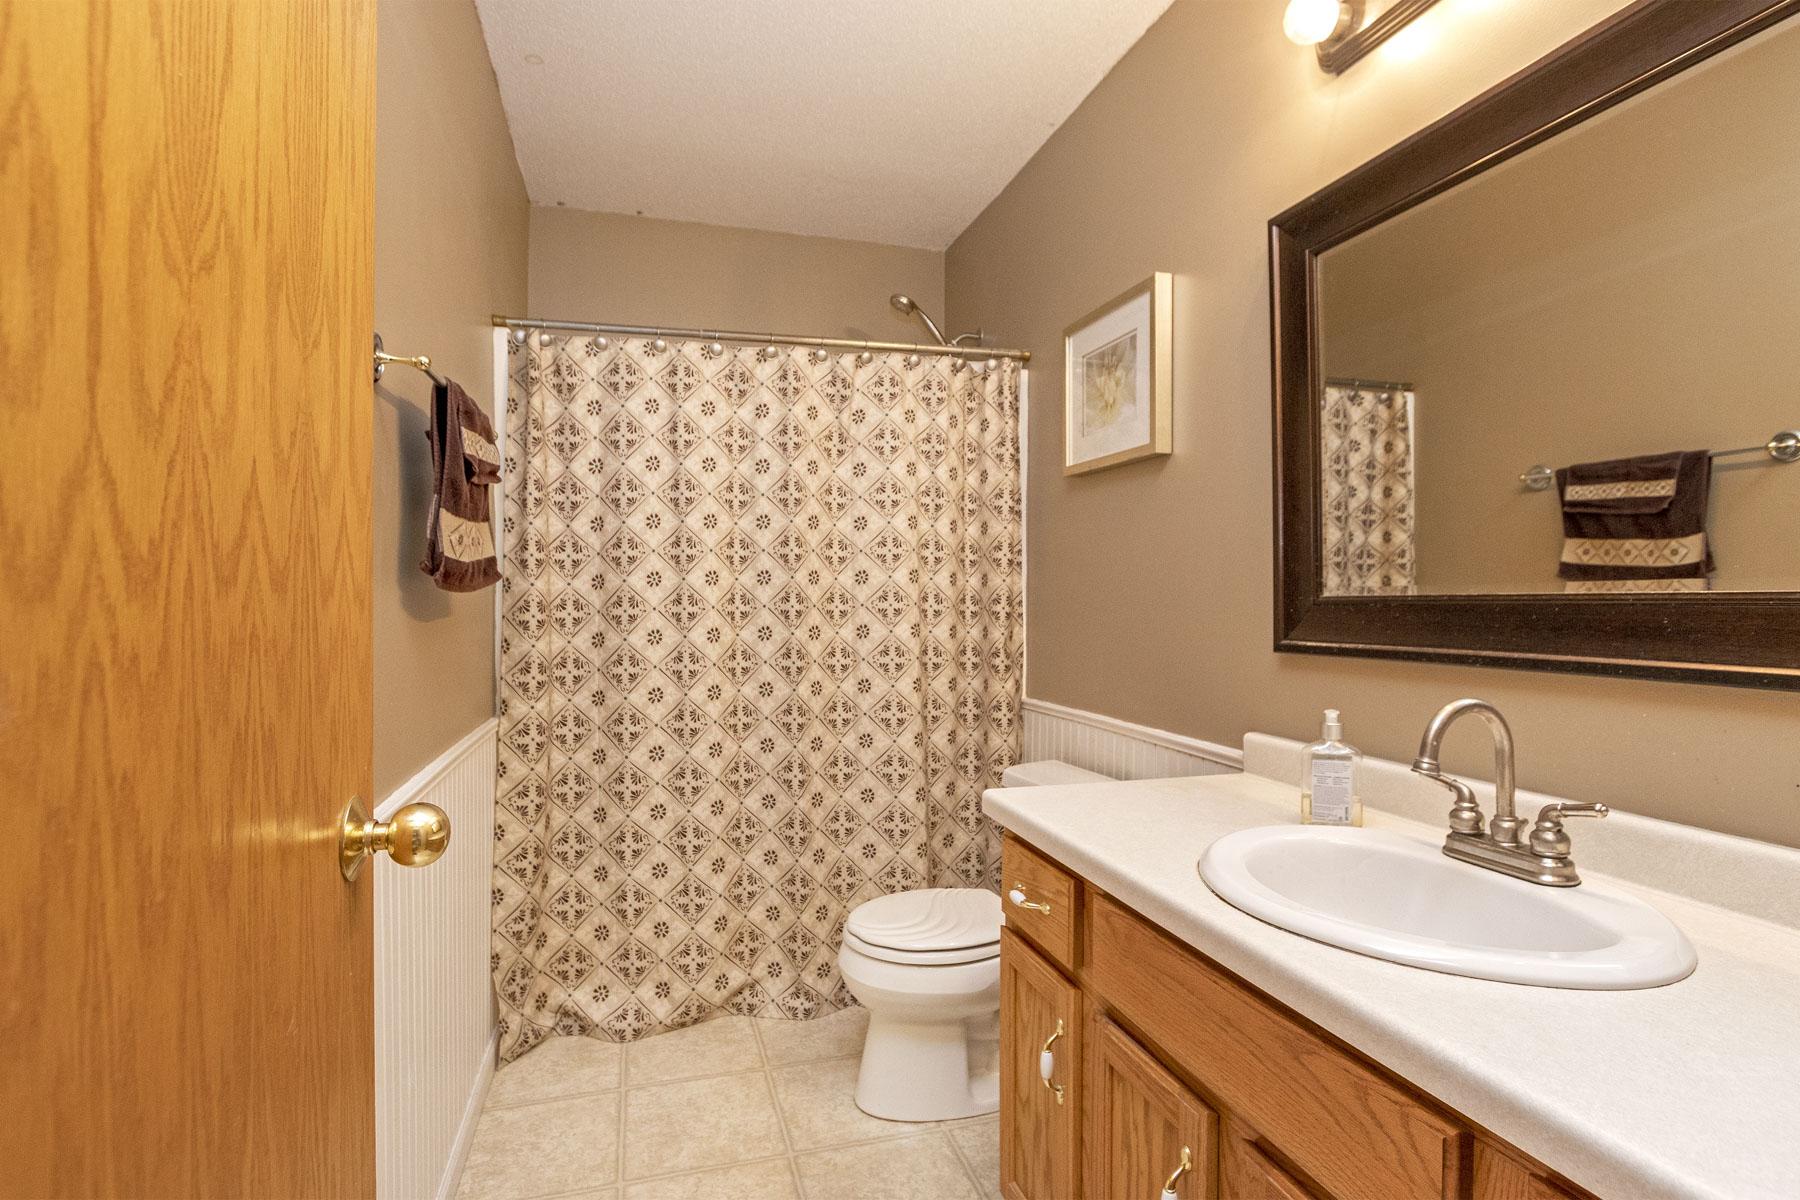 bathroom 414 8th st dodge center